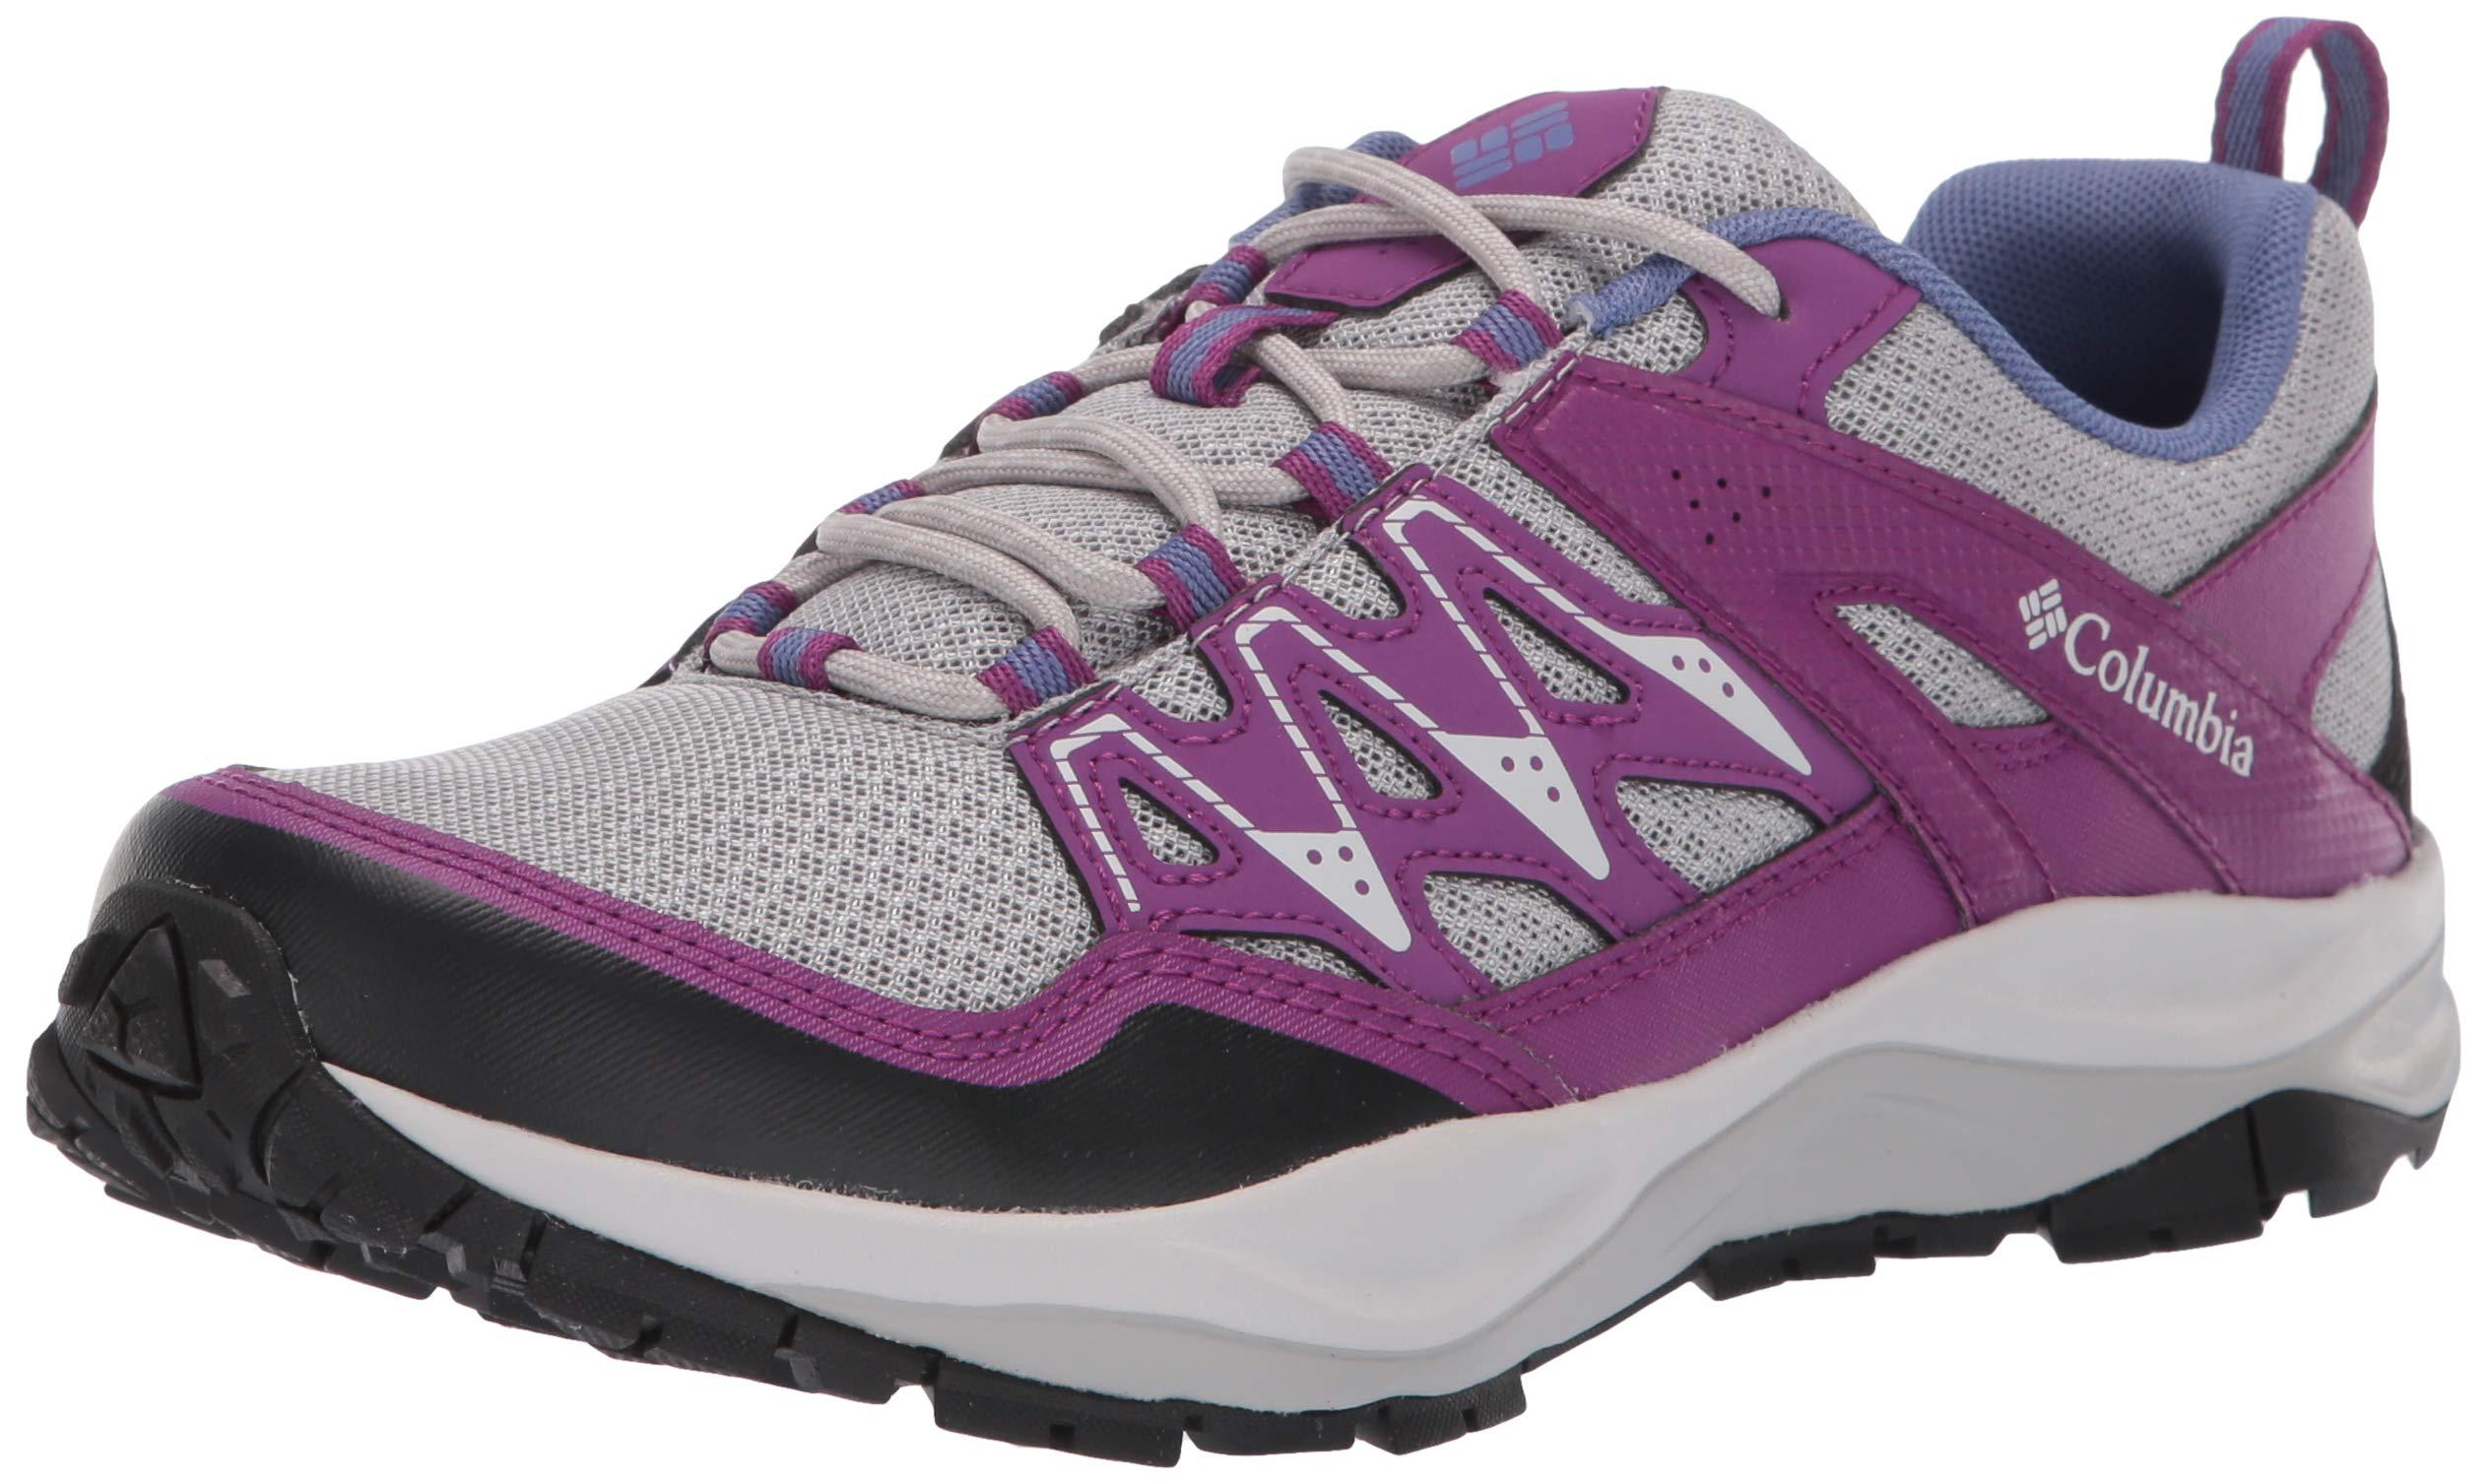 81Tvs zt6GL - Columbia Women's WAYFINDER Hiking Shoes